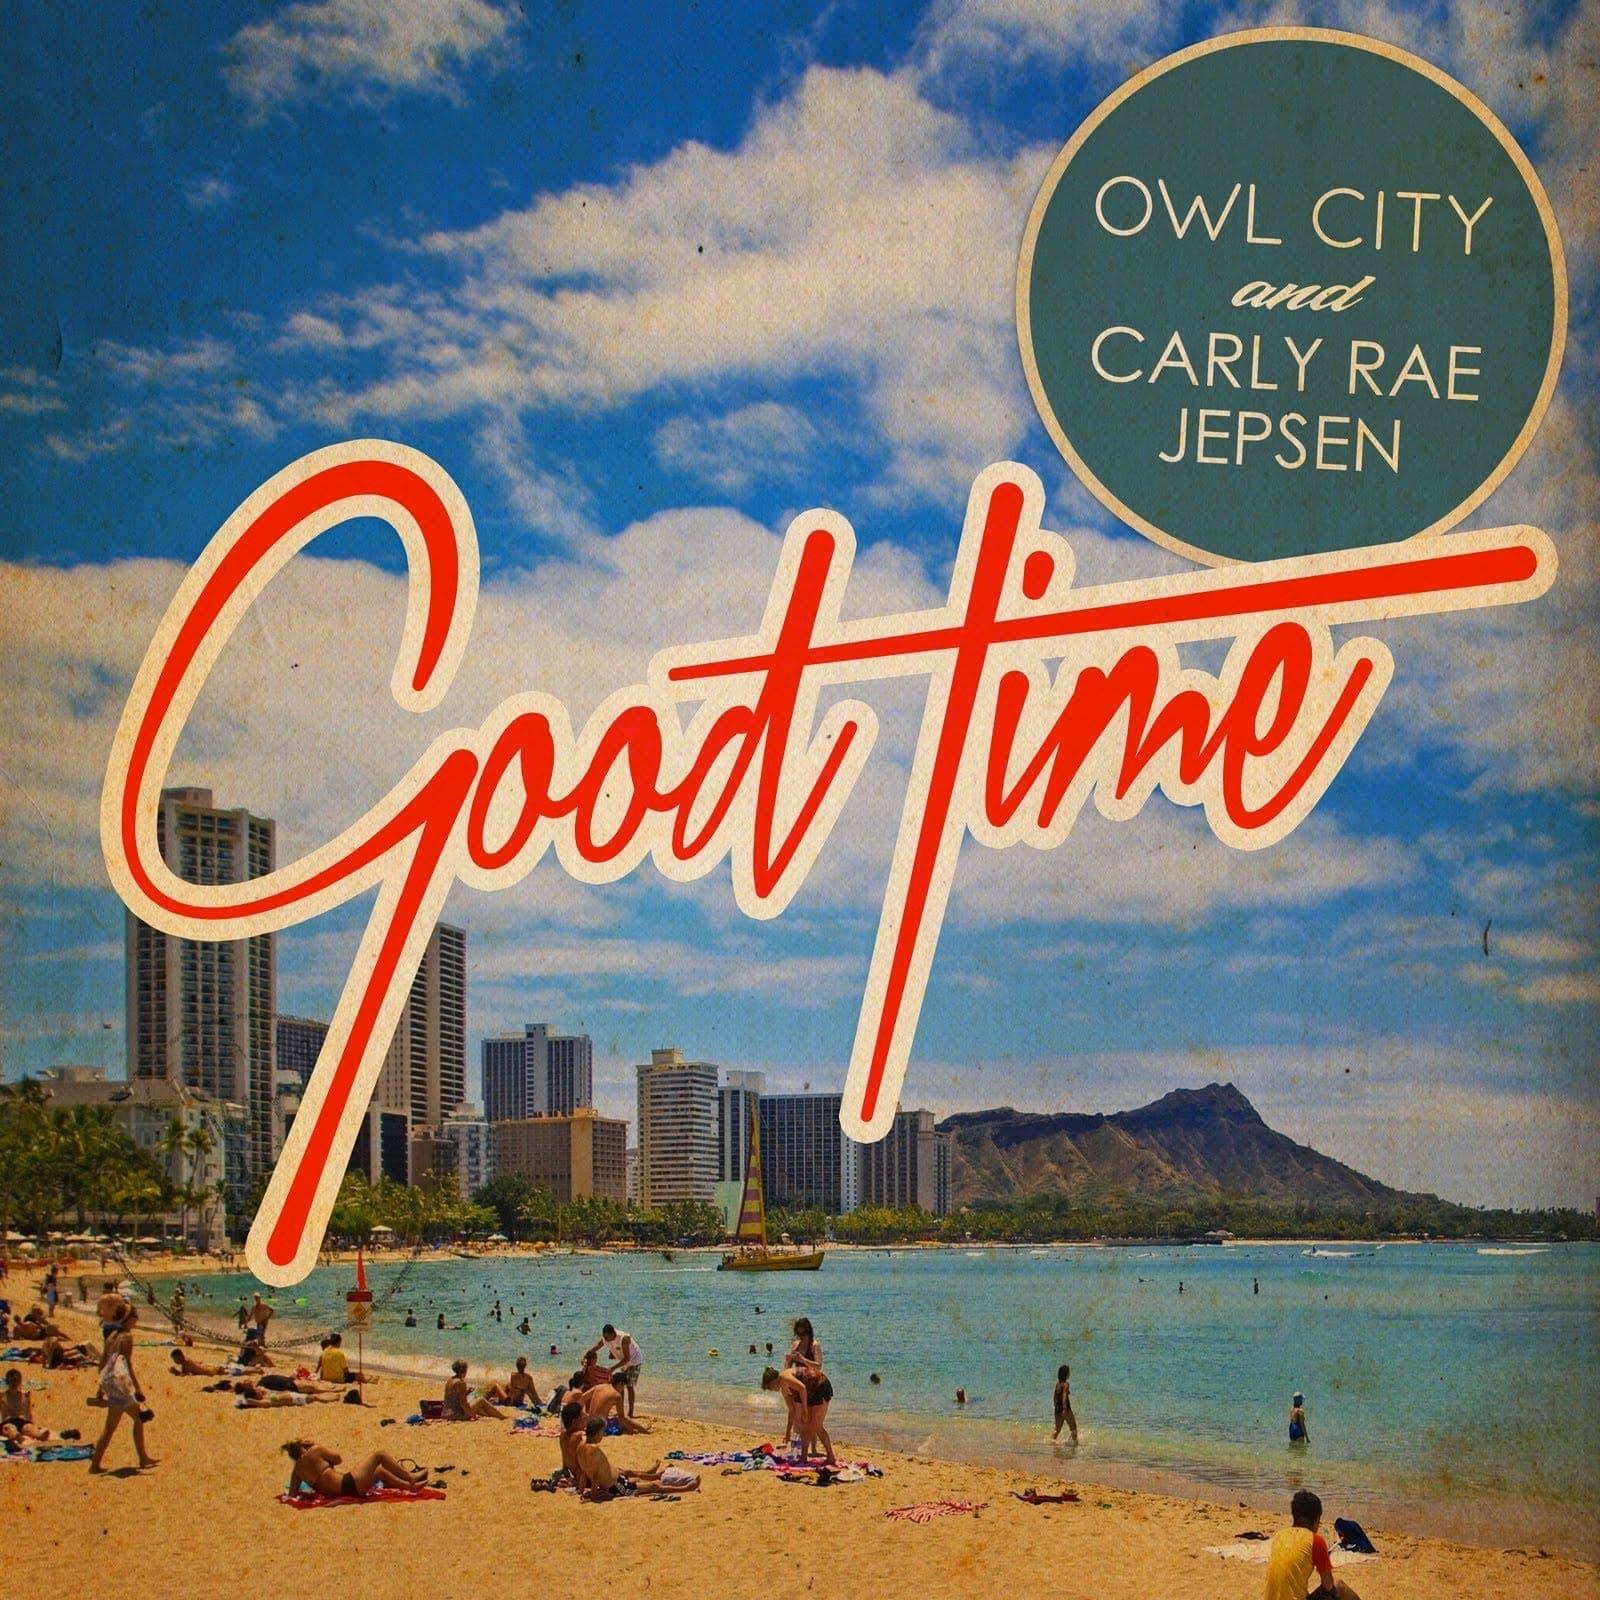 Good time - Owl City & Carly Rae Jespen